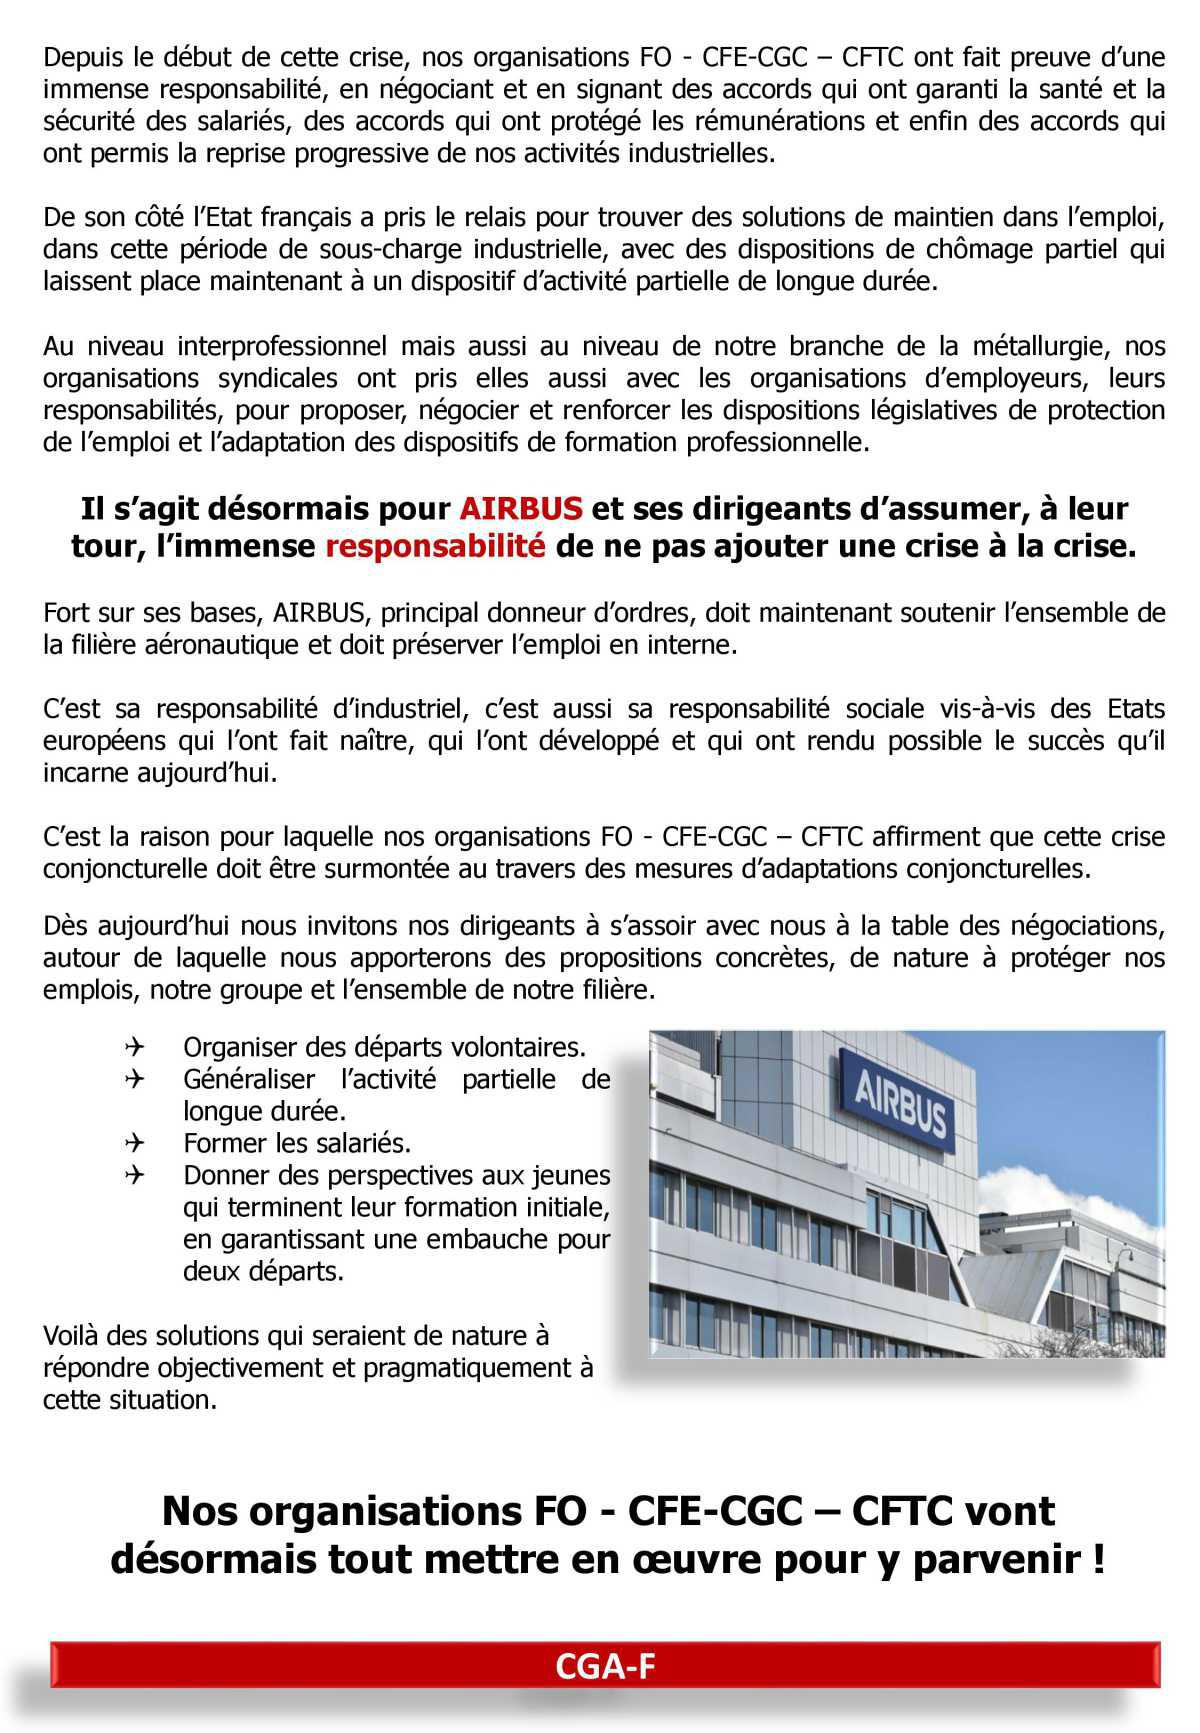 Déclaration CGA-F : FO - CFE-CGC - CFTC